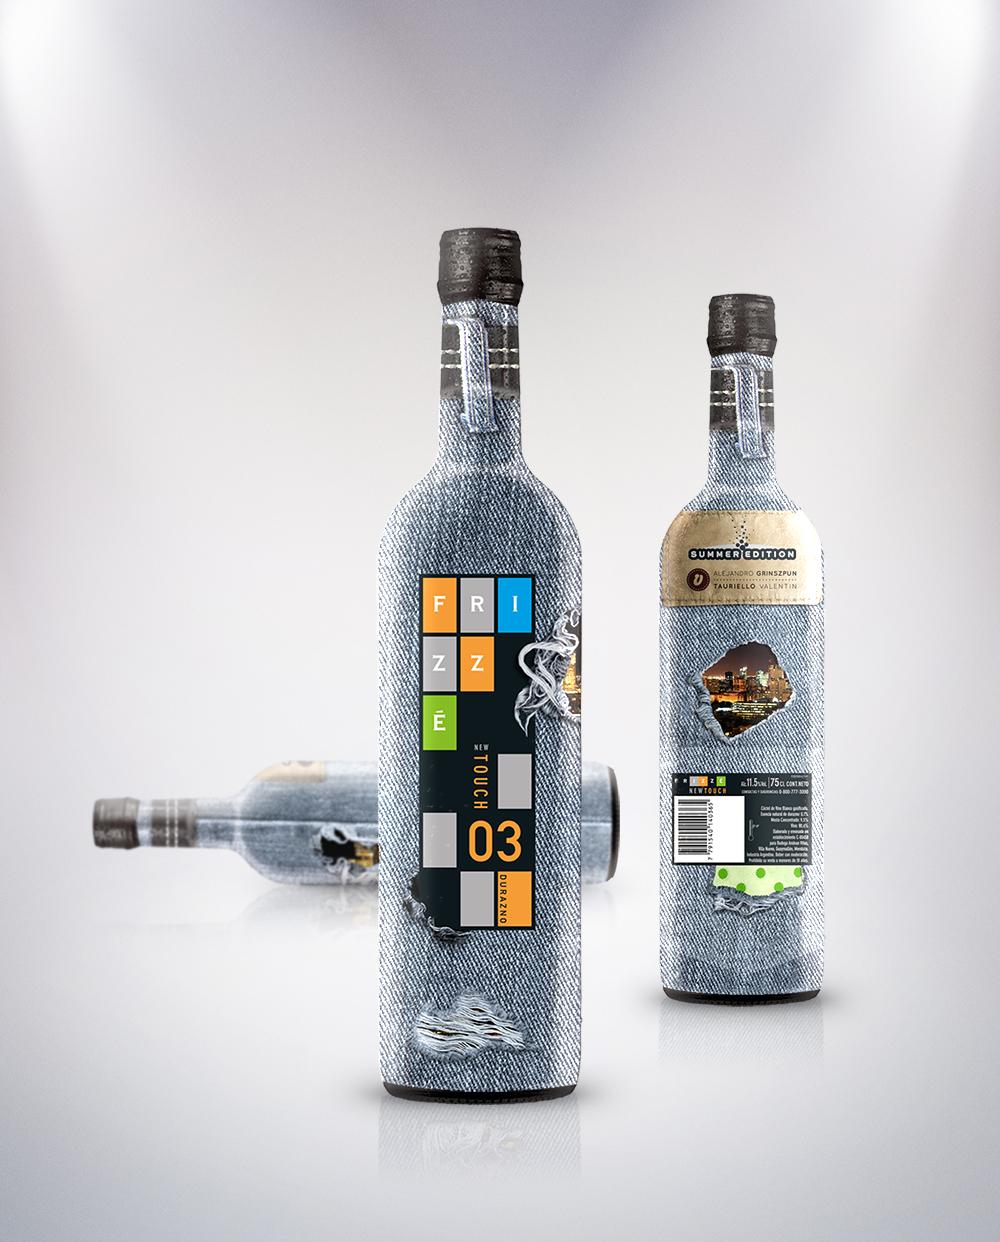 envase botella + packaging frizze Concurso vino wine bottle espumante